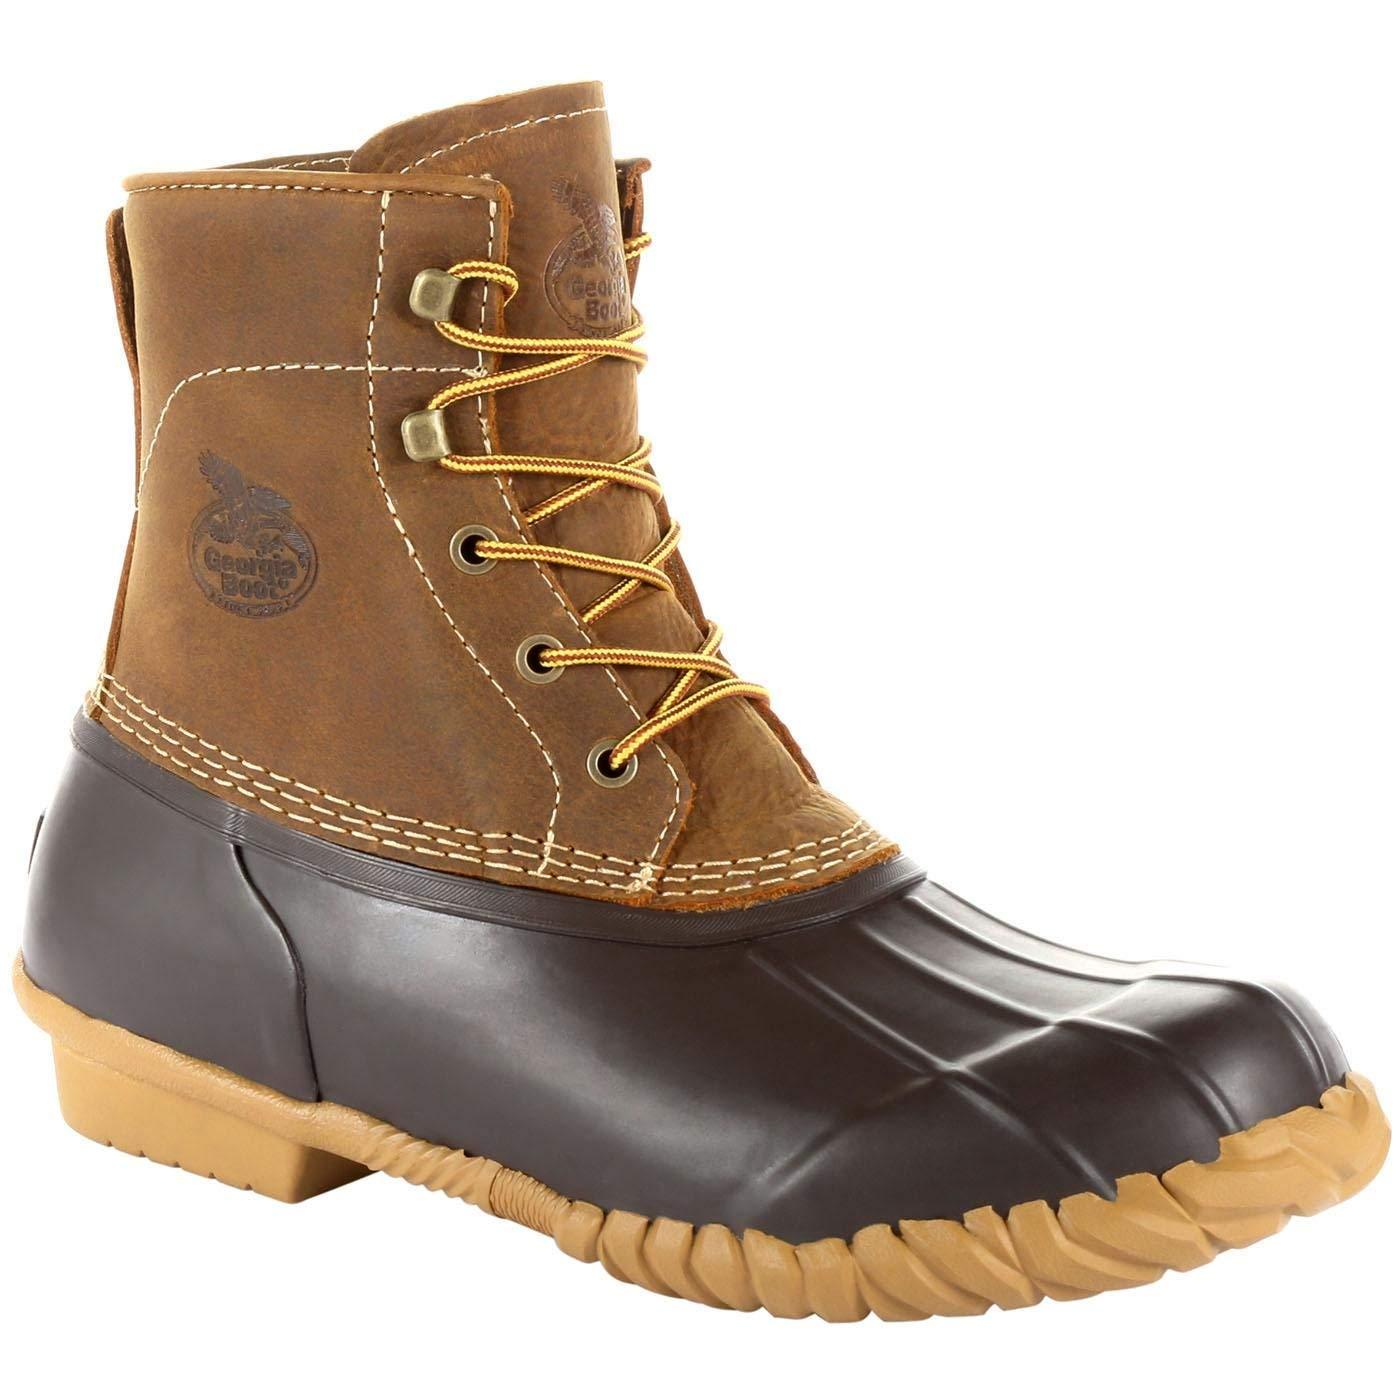 Georgia Boot Marshland Unisex Duck Boot